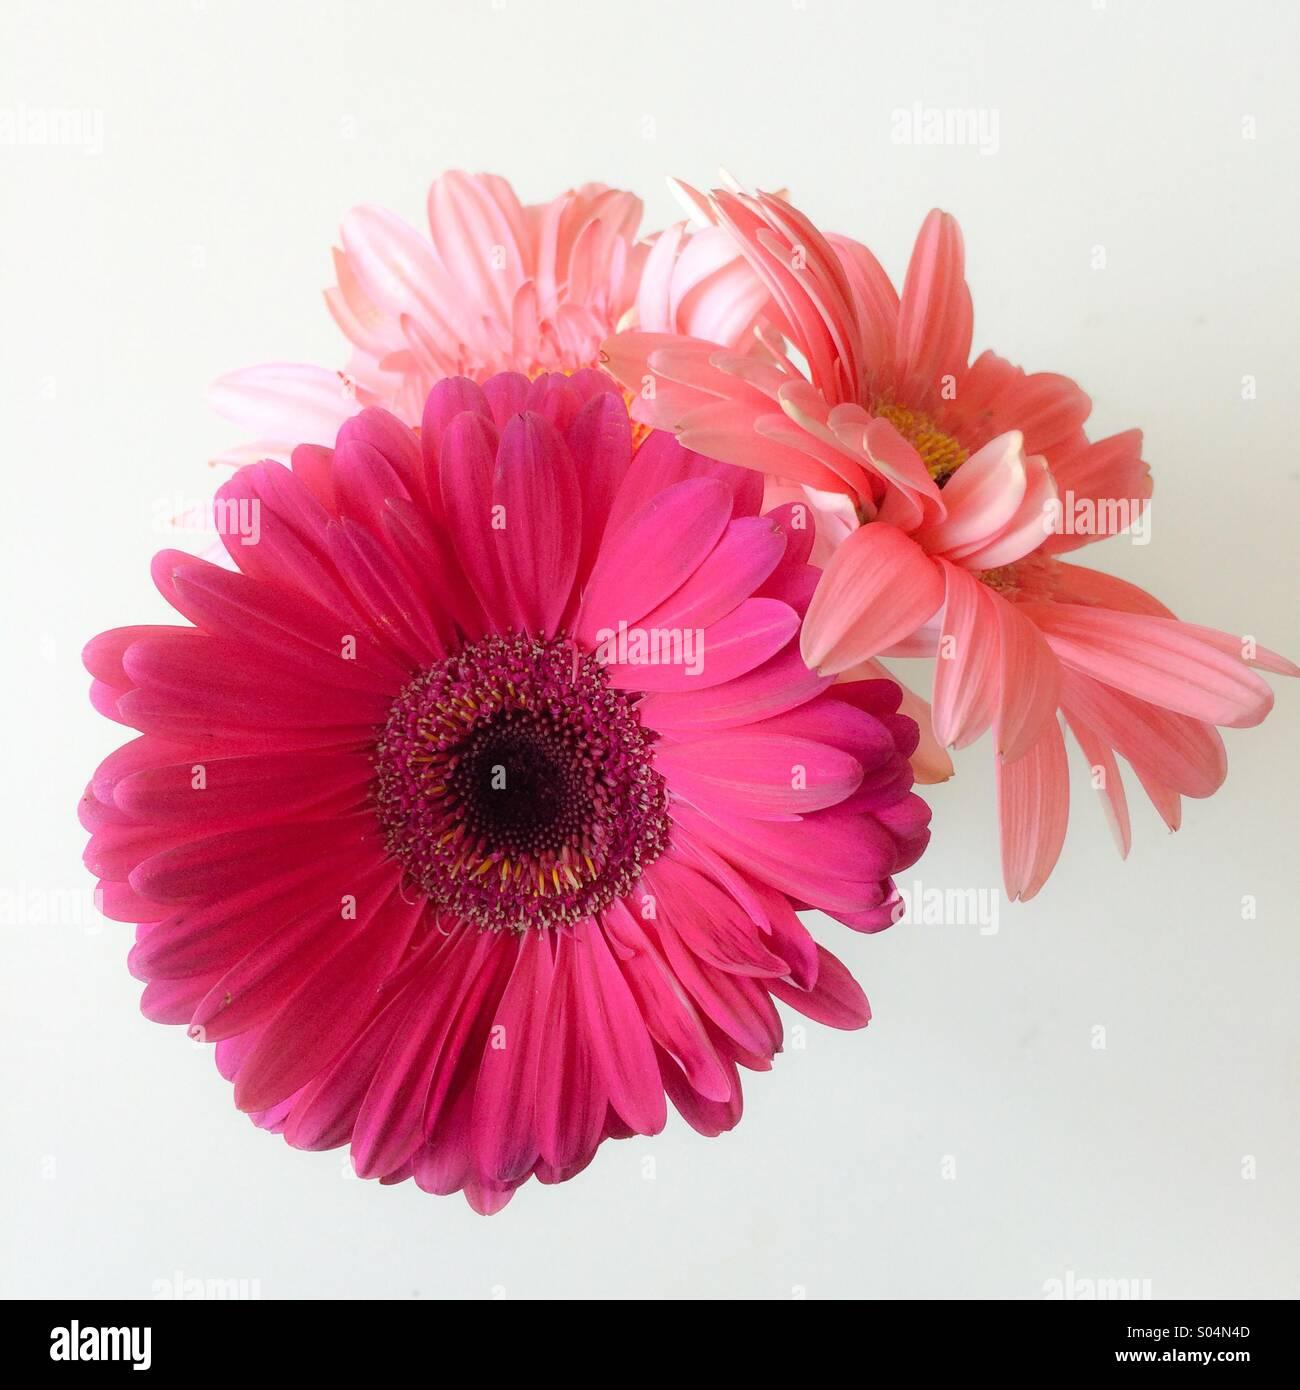 Three gerber daisies - Stock Image